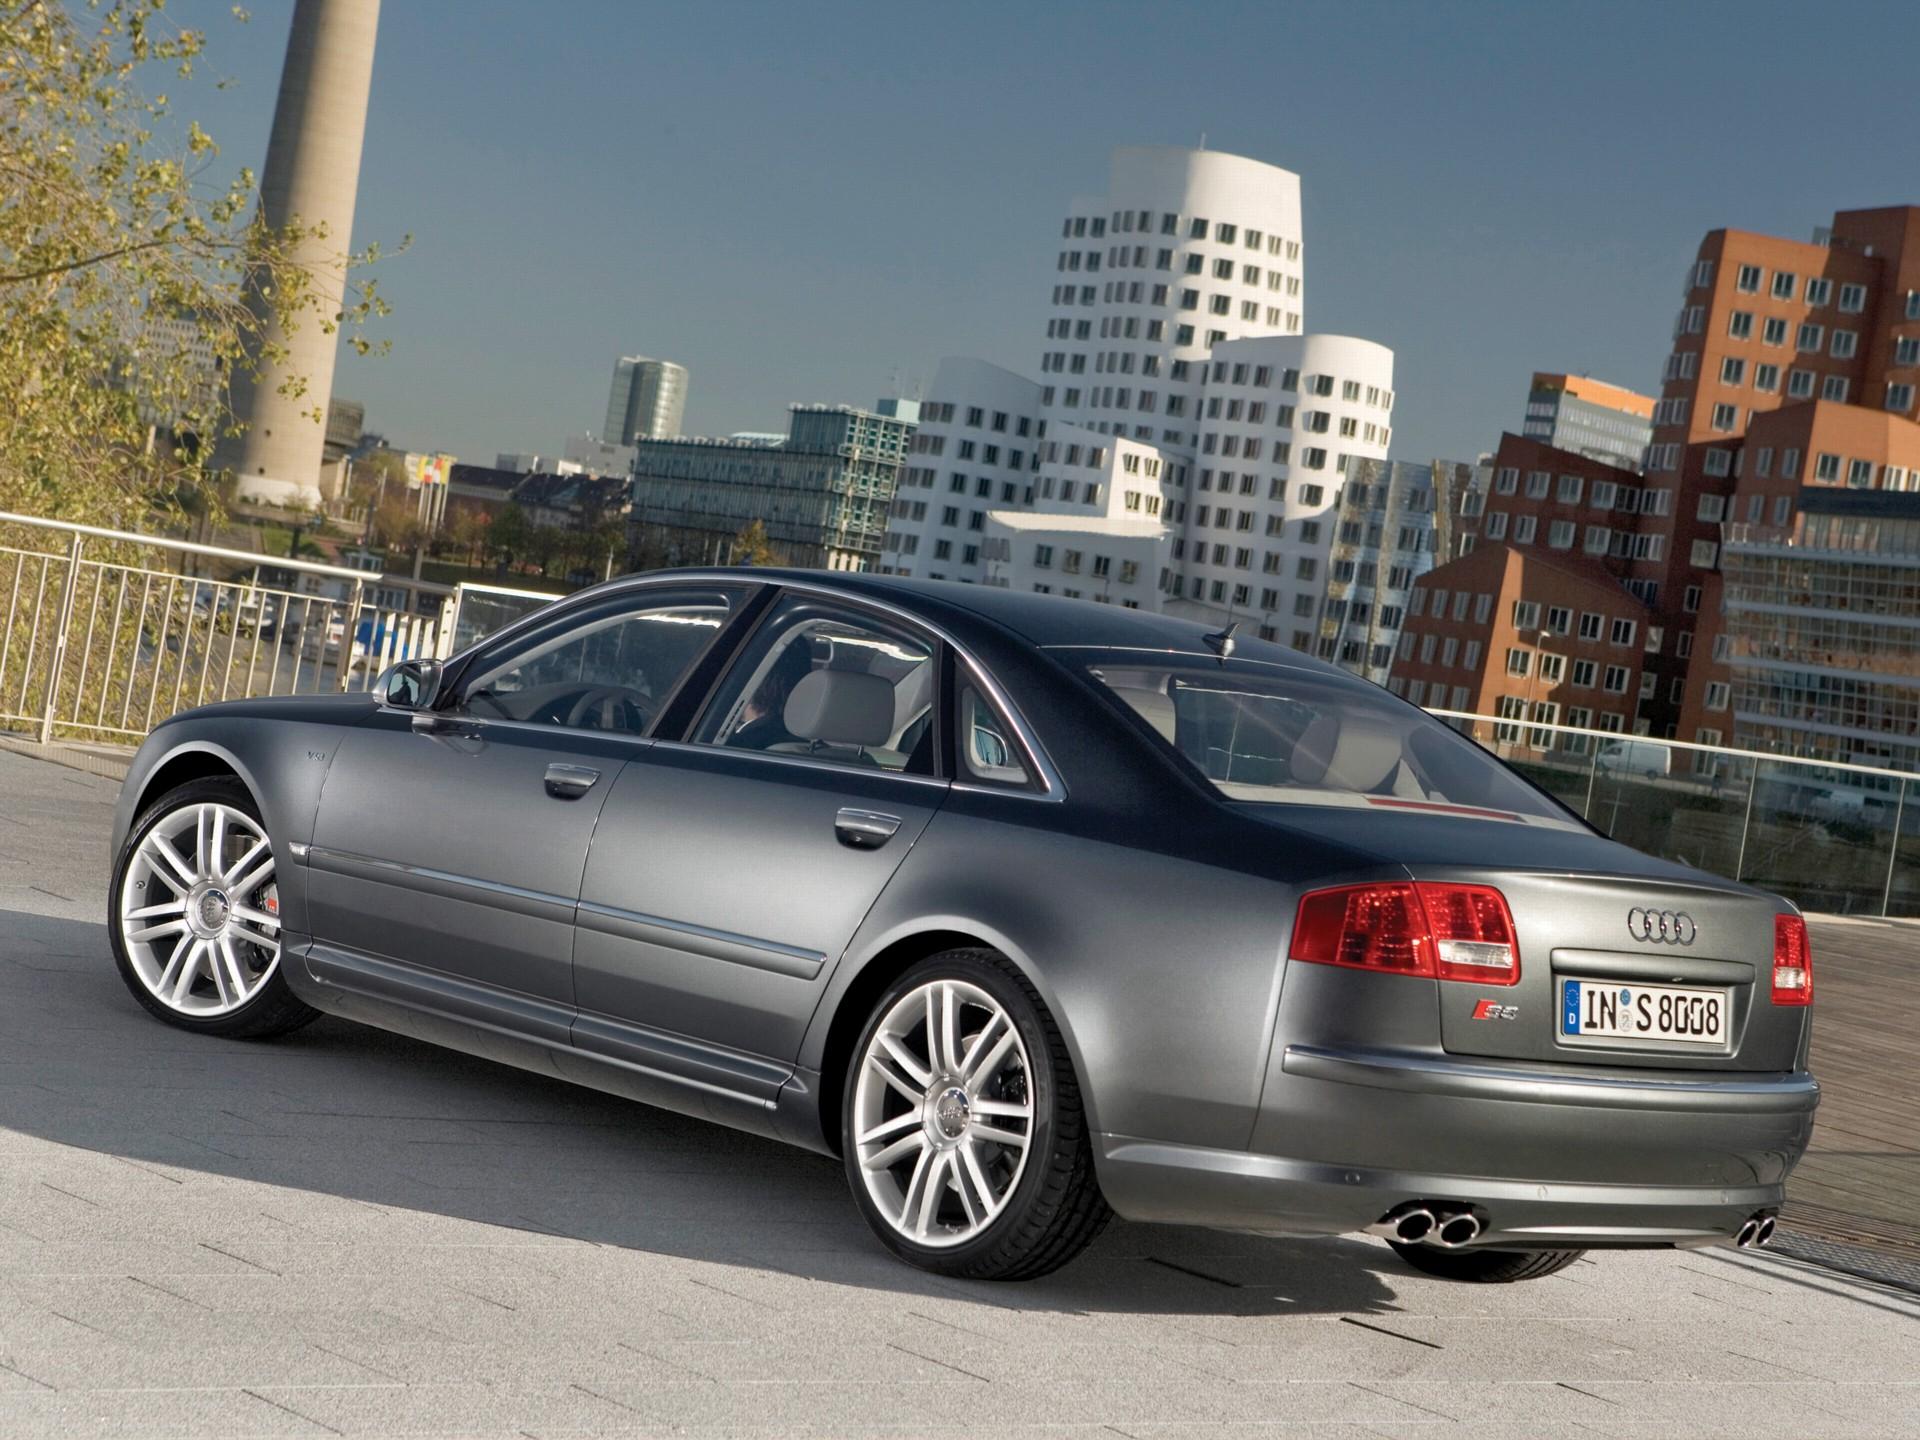 Audi S Image Photo Of - 2007 audi s8